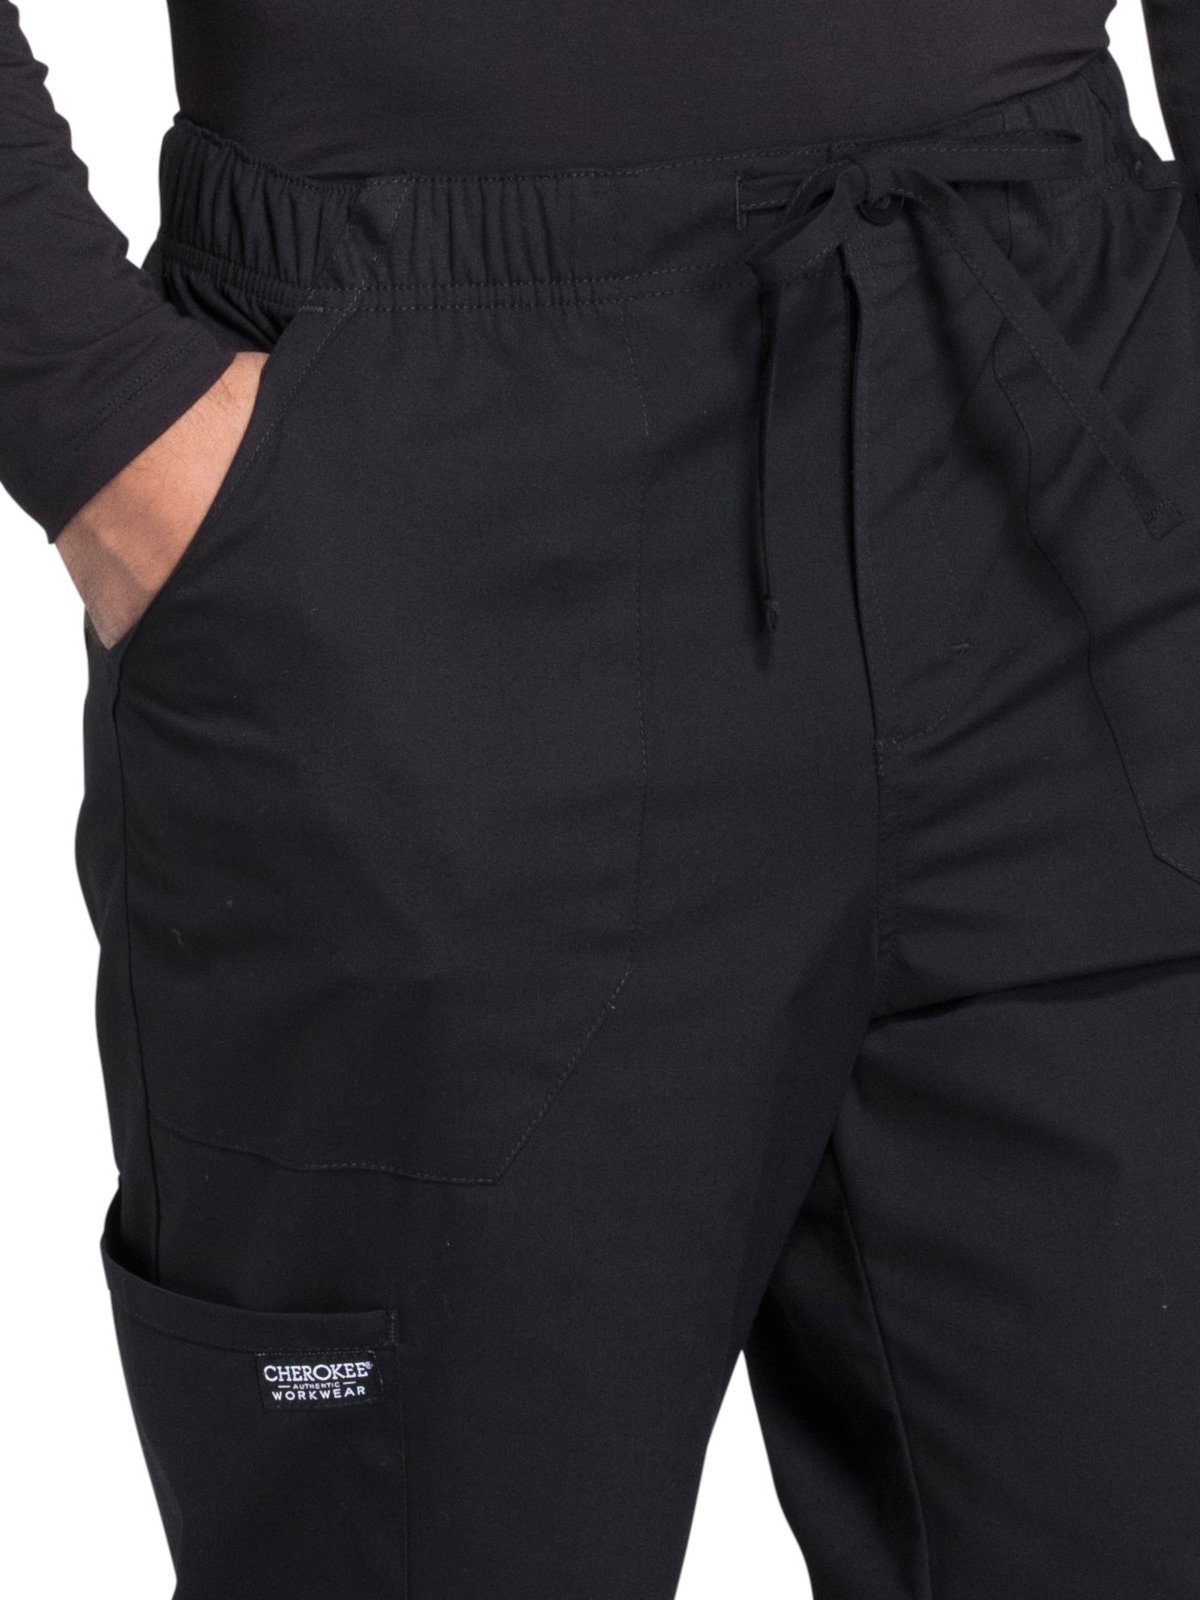 Cherokee Professionals Workwear Men's Tapered Leg Zip Fly Drawstring Scrub Pant X-Large Tall Black by Cherokee (Image #3)